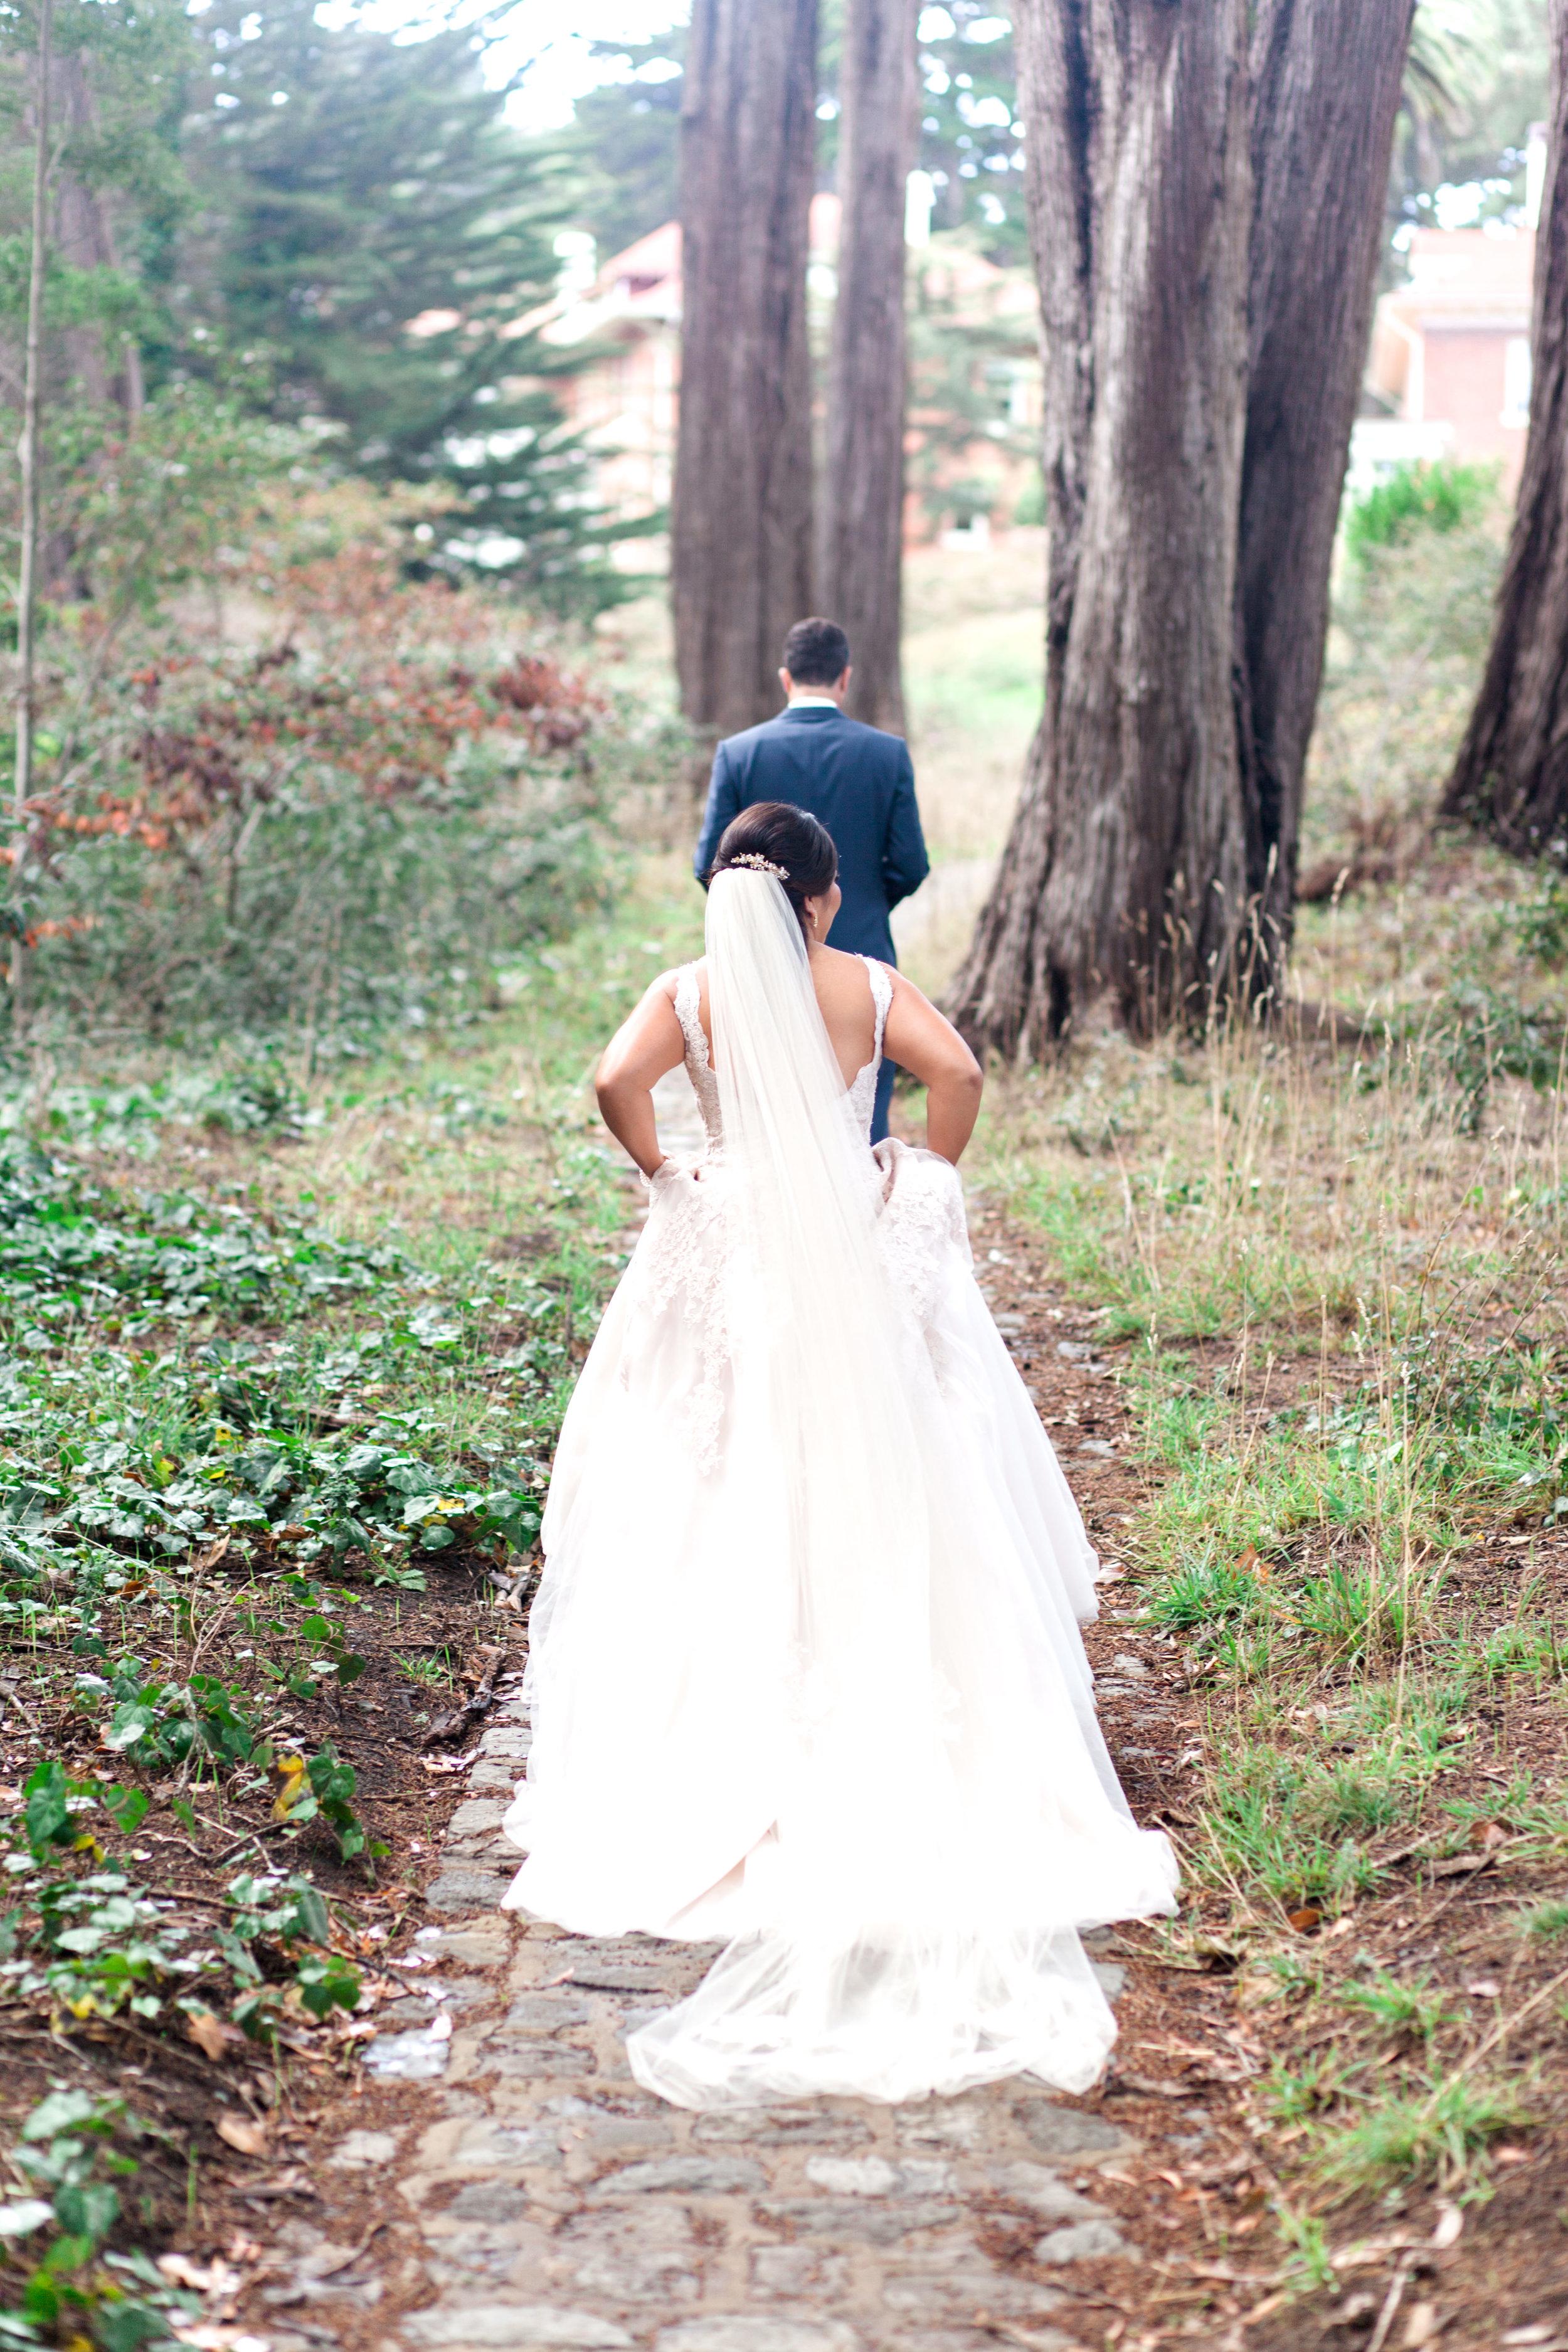 style-inspired-wedding-at-the-presidio-in-san-francisco.jpg